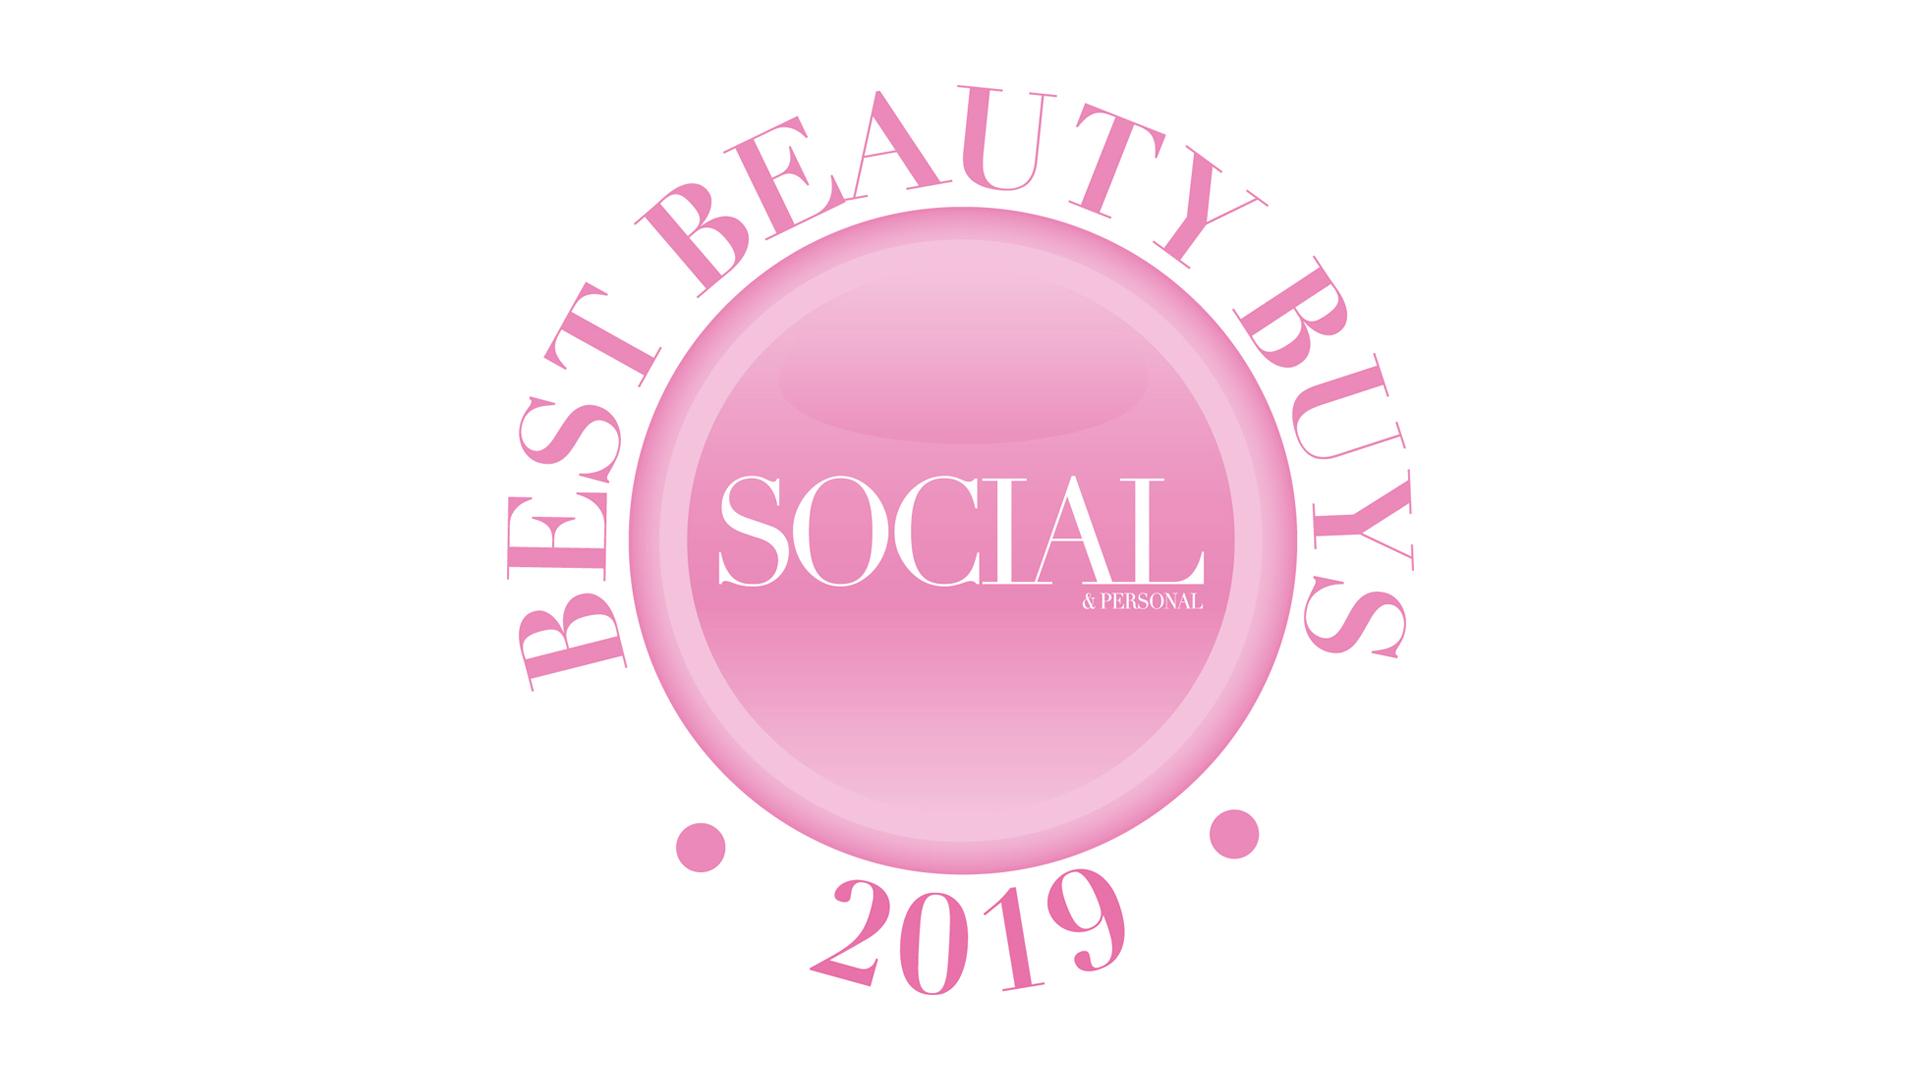 Best Beauty Buys Social 2019